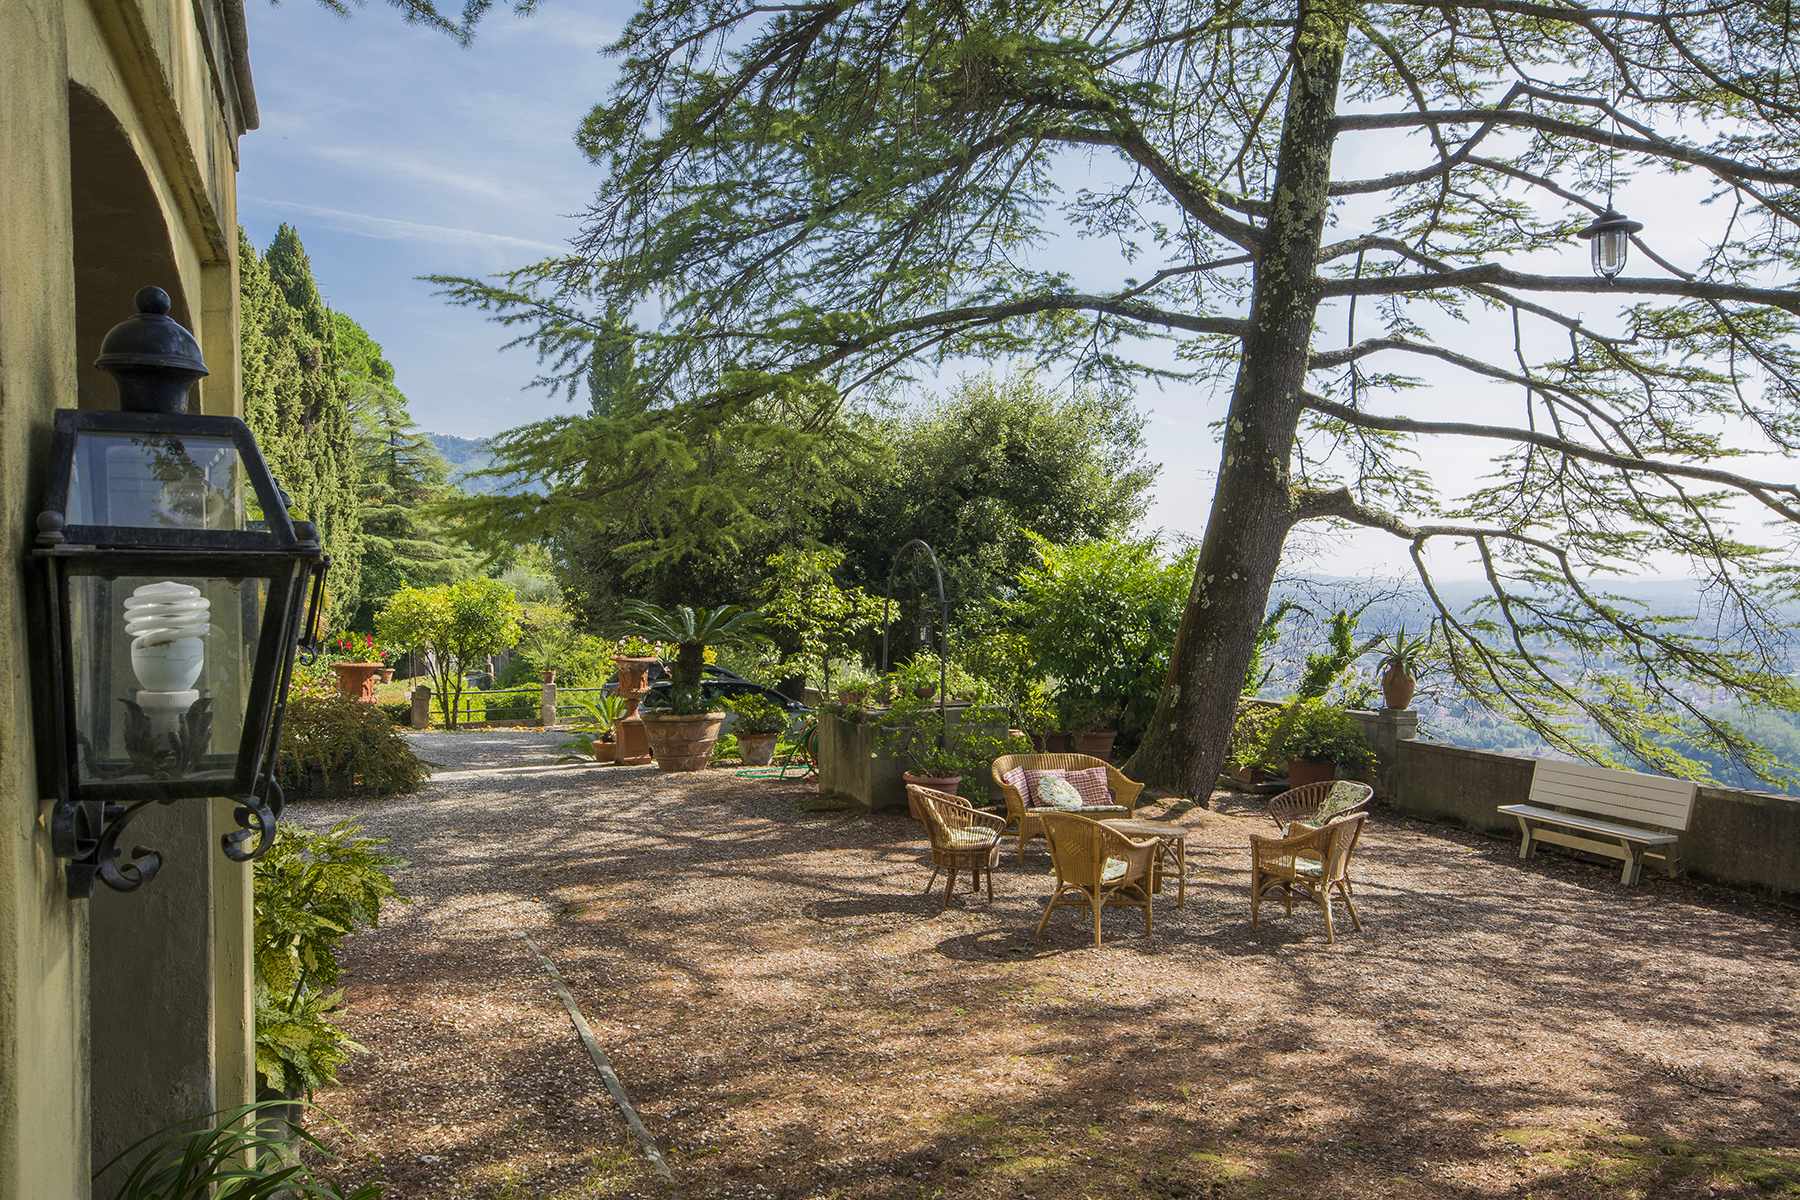 Villa in Vendita a Lucca: 5 locali, 1210 mq - Foto 13